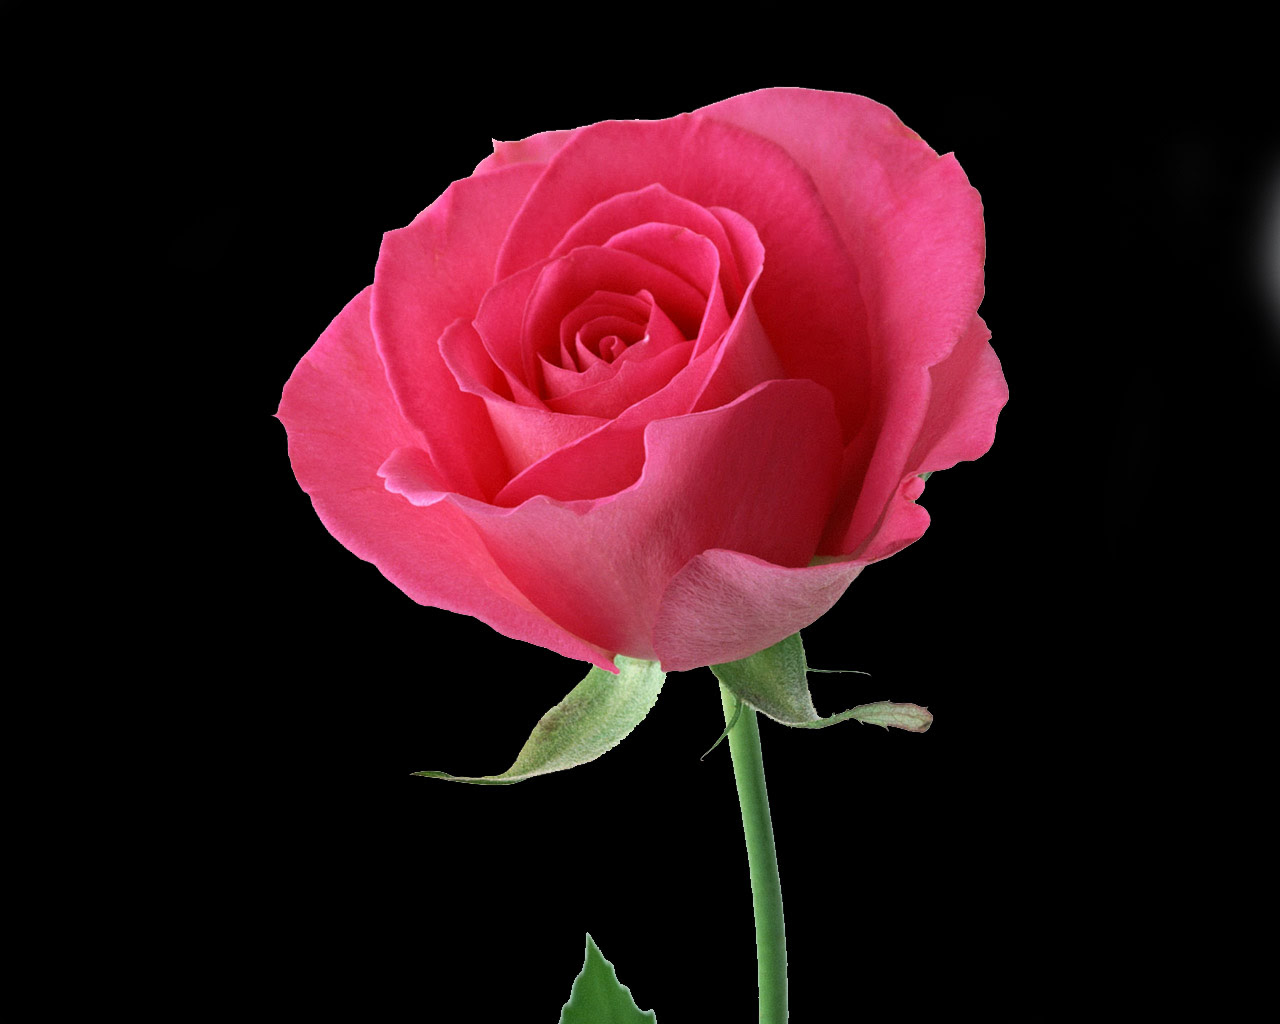 Beautiful Red Rose Flower Photo Wallpaper 1280x1024 22590